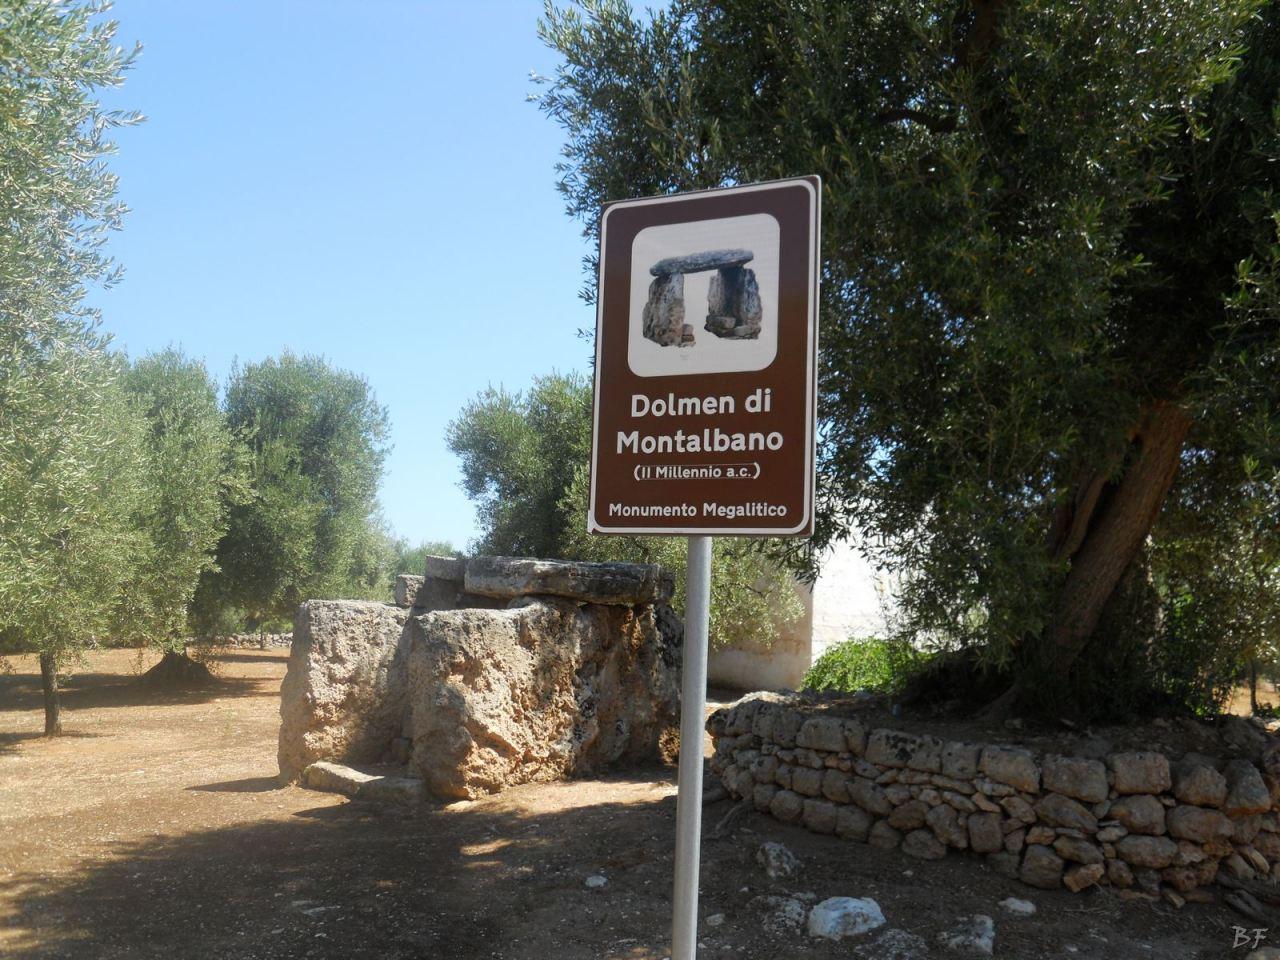 Dolmen-Montalbano-Fasano-Ostuni-Megaliti-Salento-Brindisi-Puglia-Italia-1